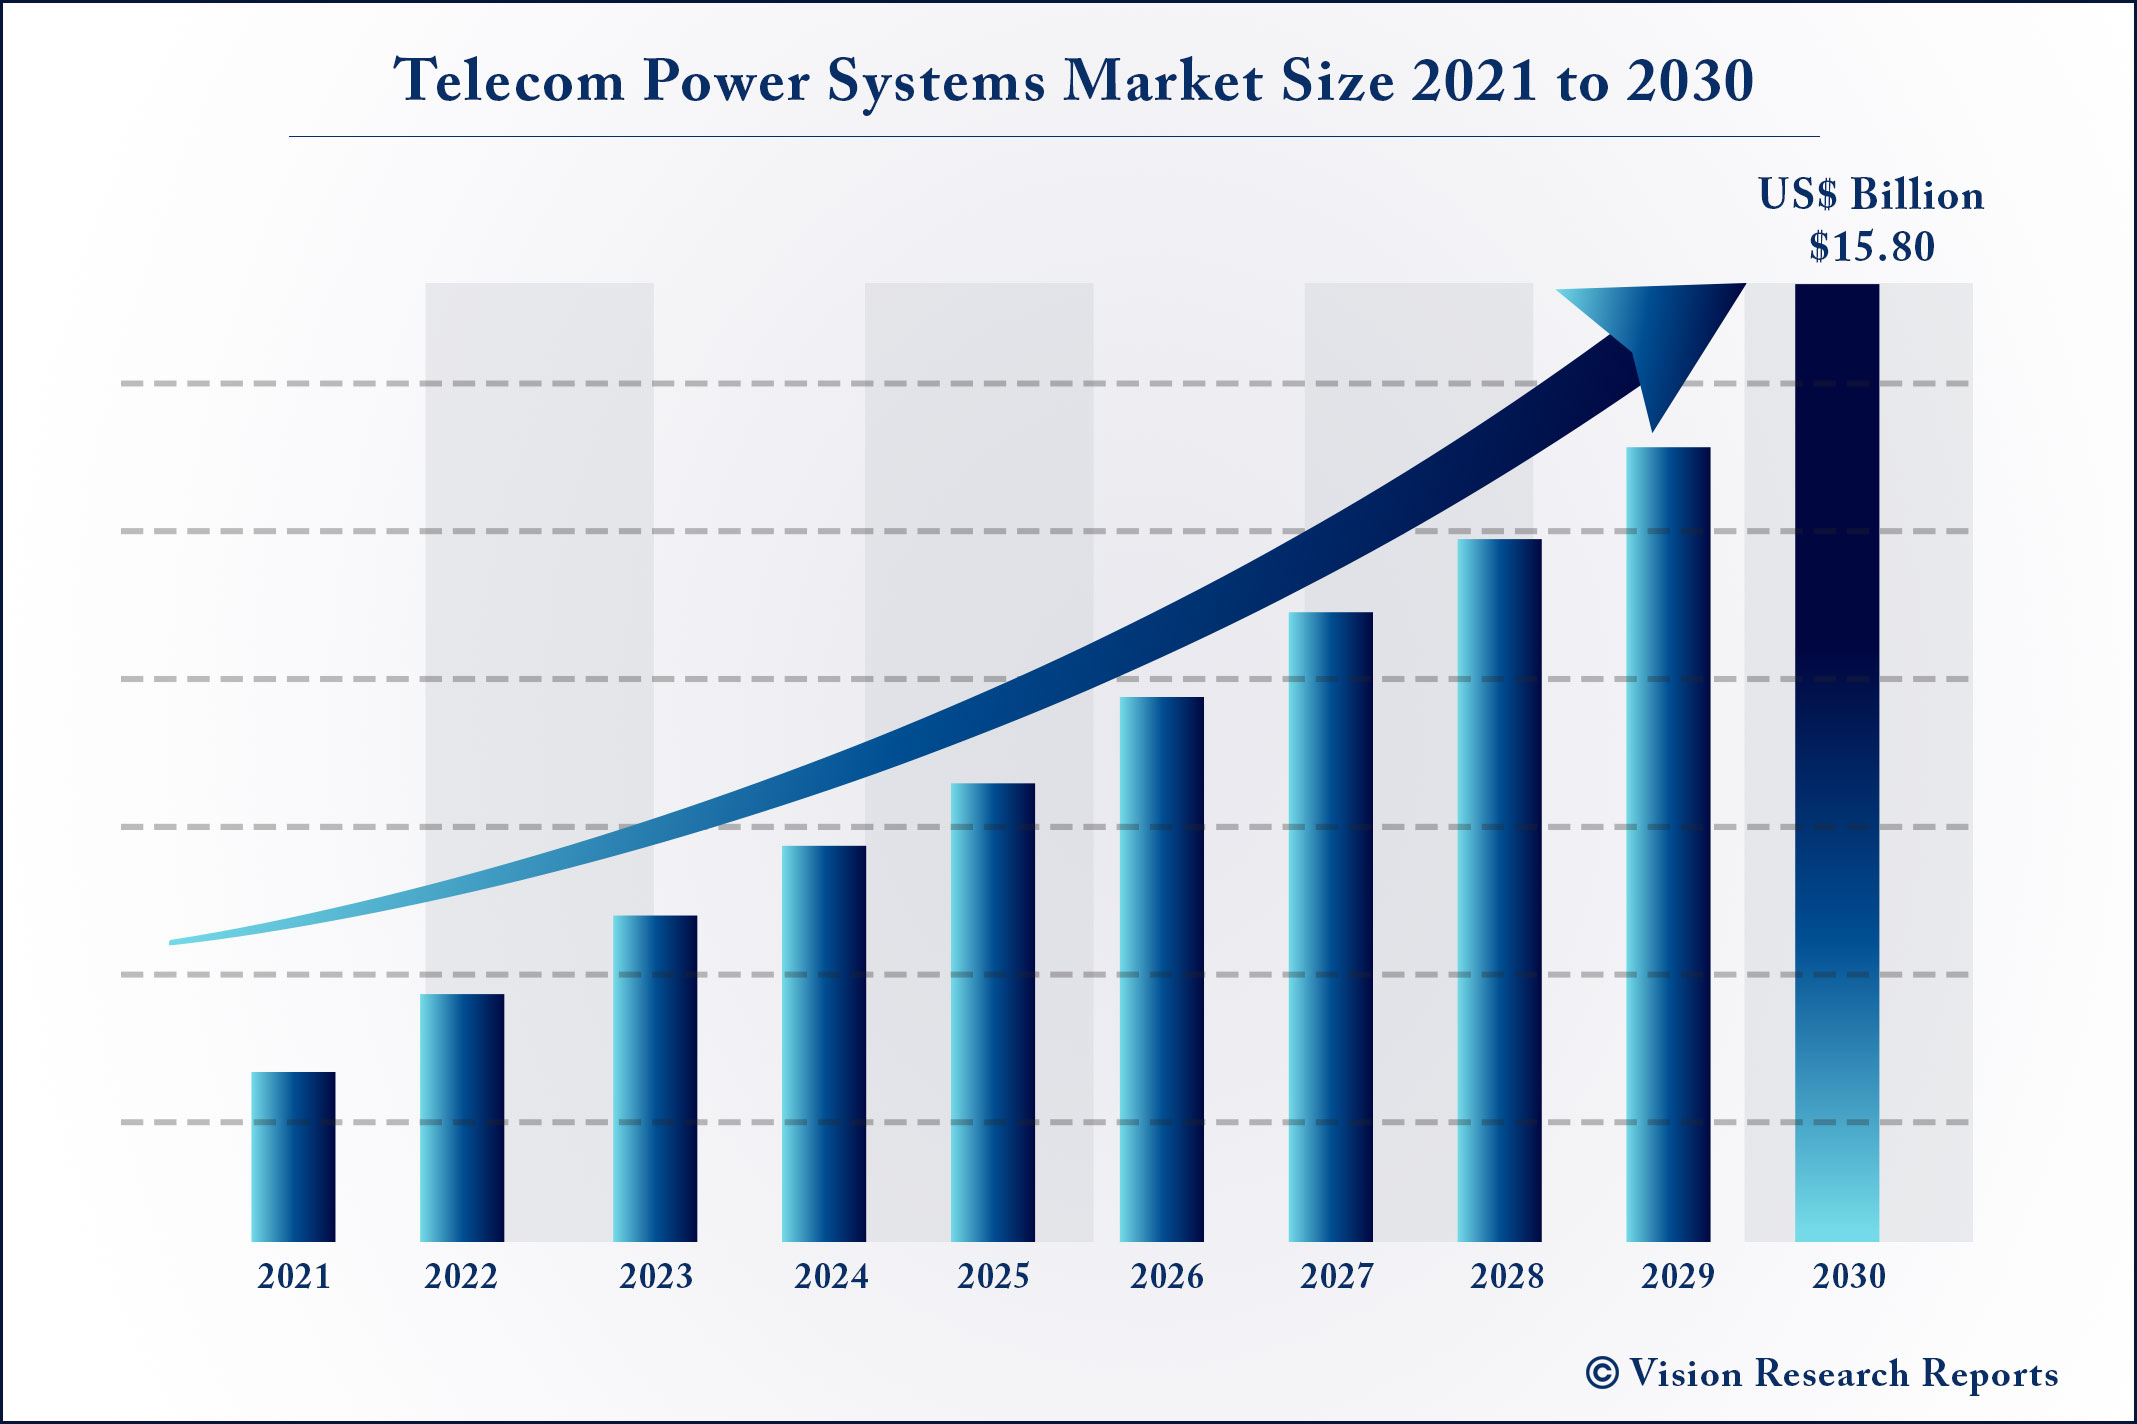 Telecom Power Systems Market Size 2021 to 2030